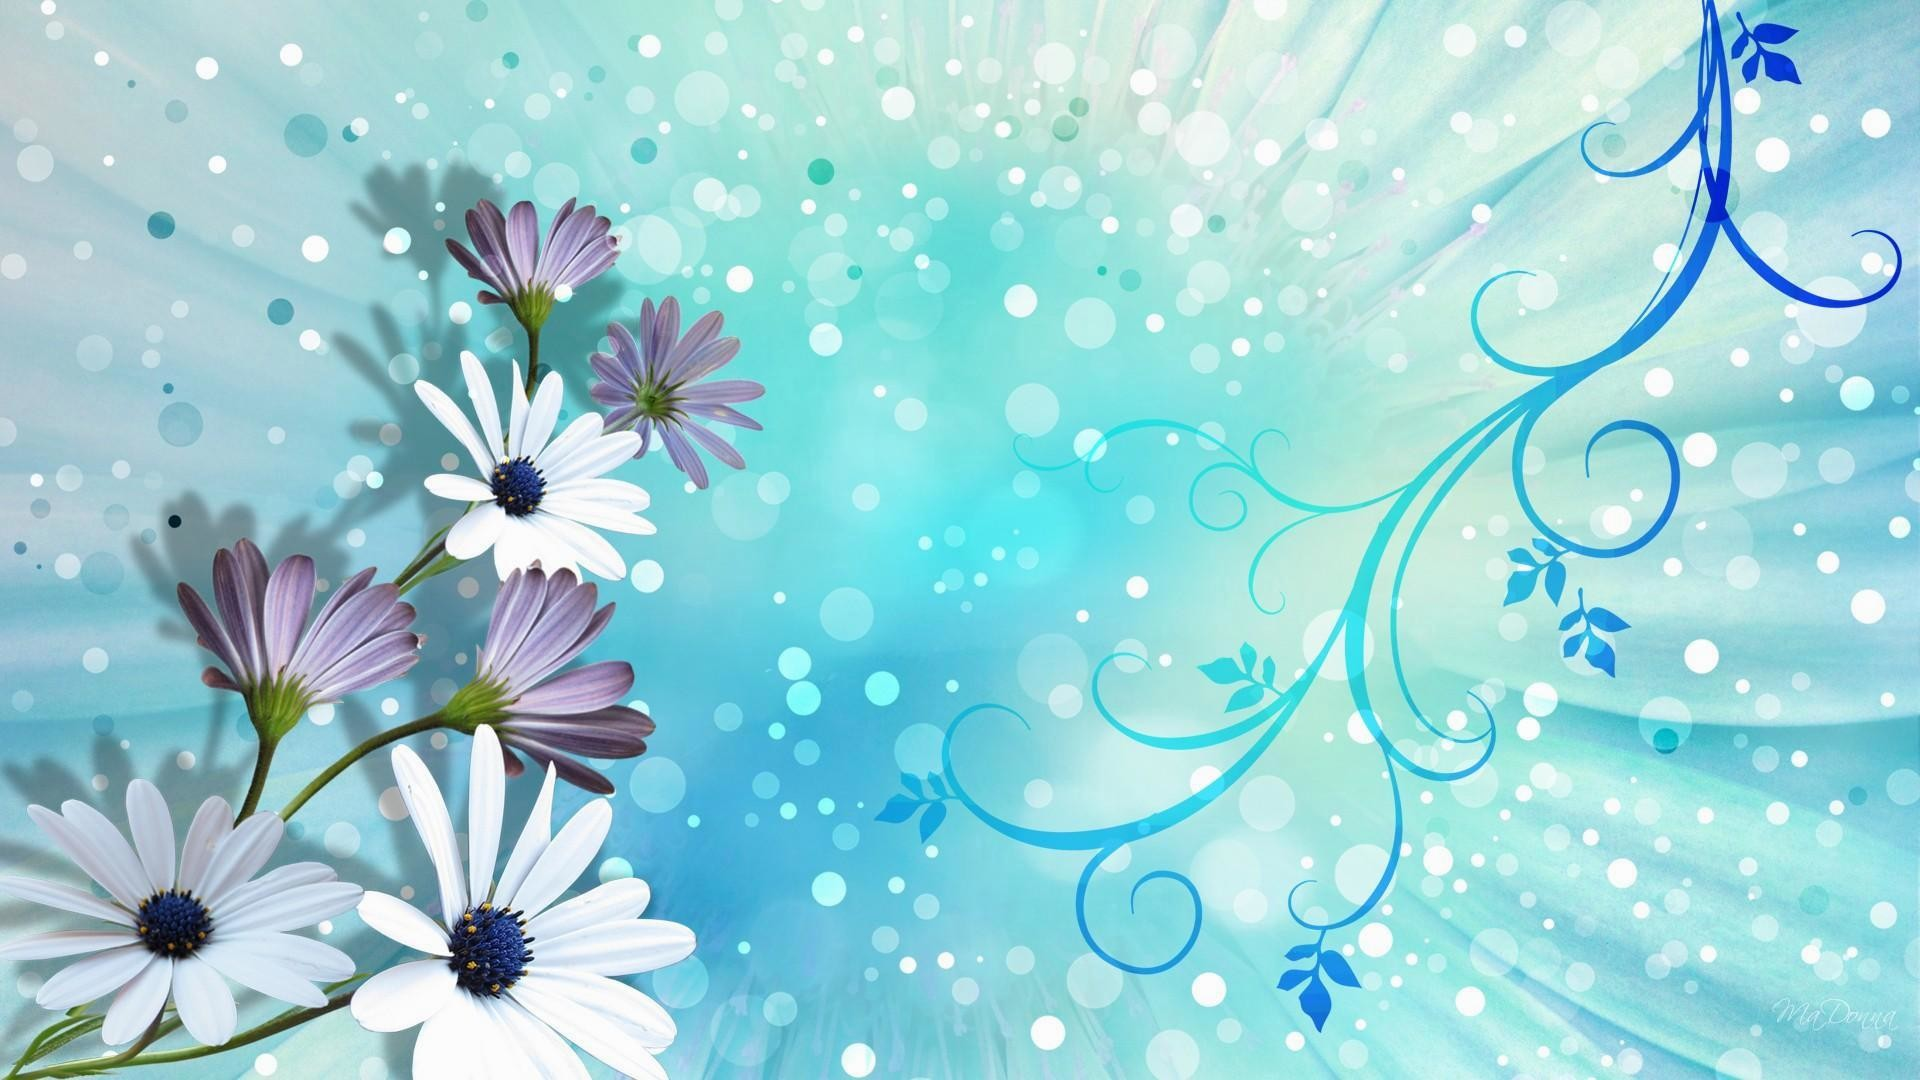 wallpaper.wiki-Aqua-Blue-Wallpapers-HD-PIC-WPC0011965